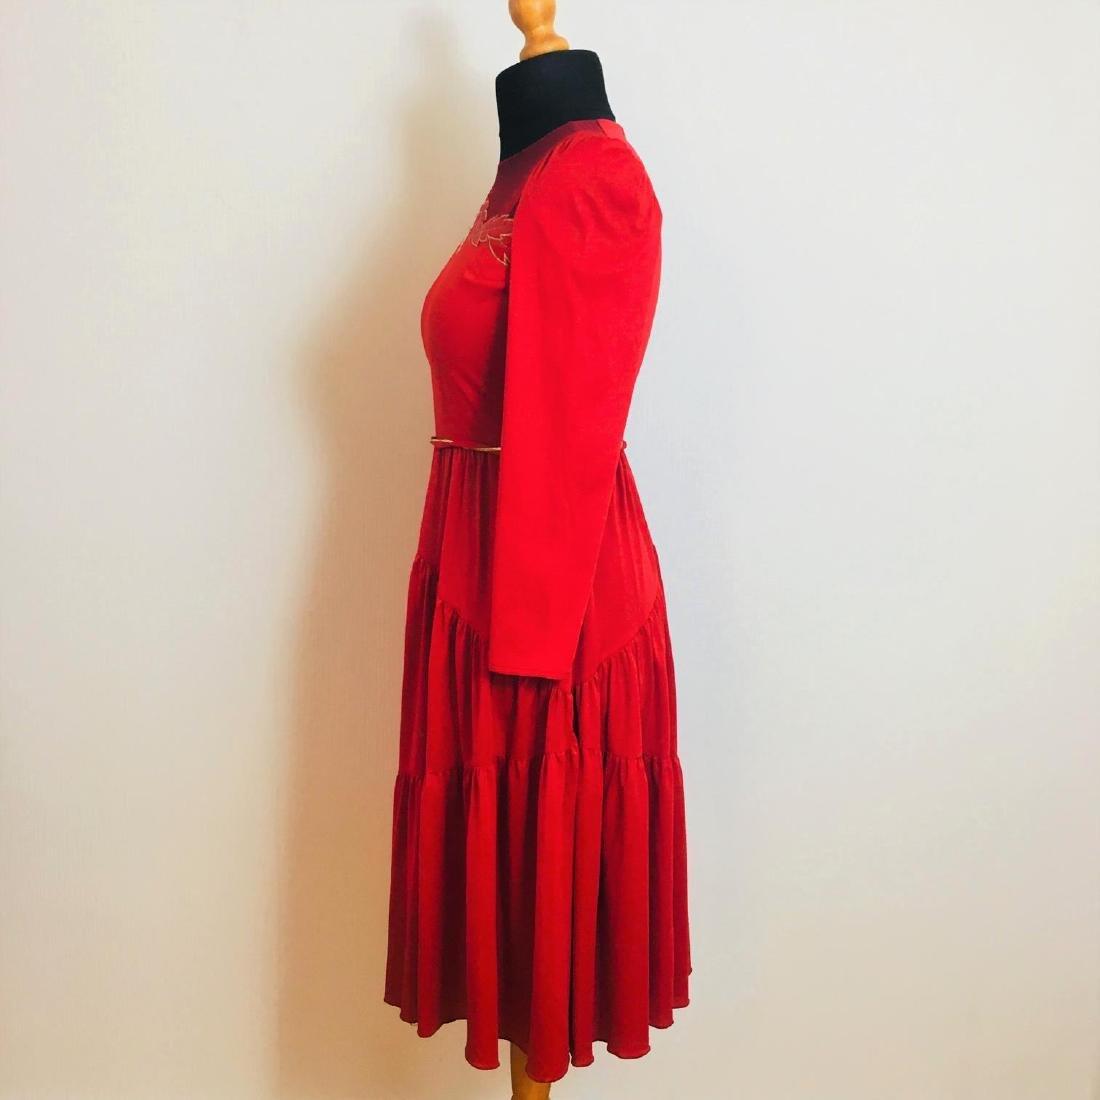 Women's Mag Fortail Designer Paris Cocktail Dress - 4